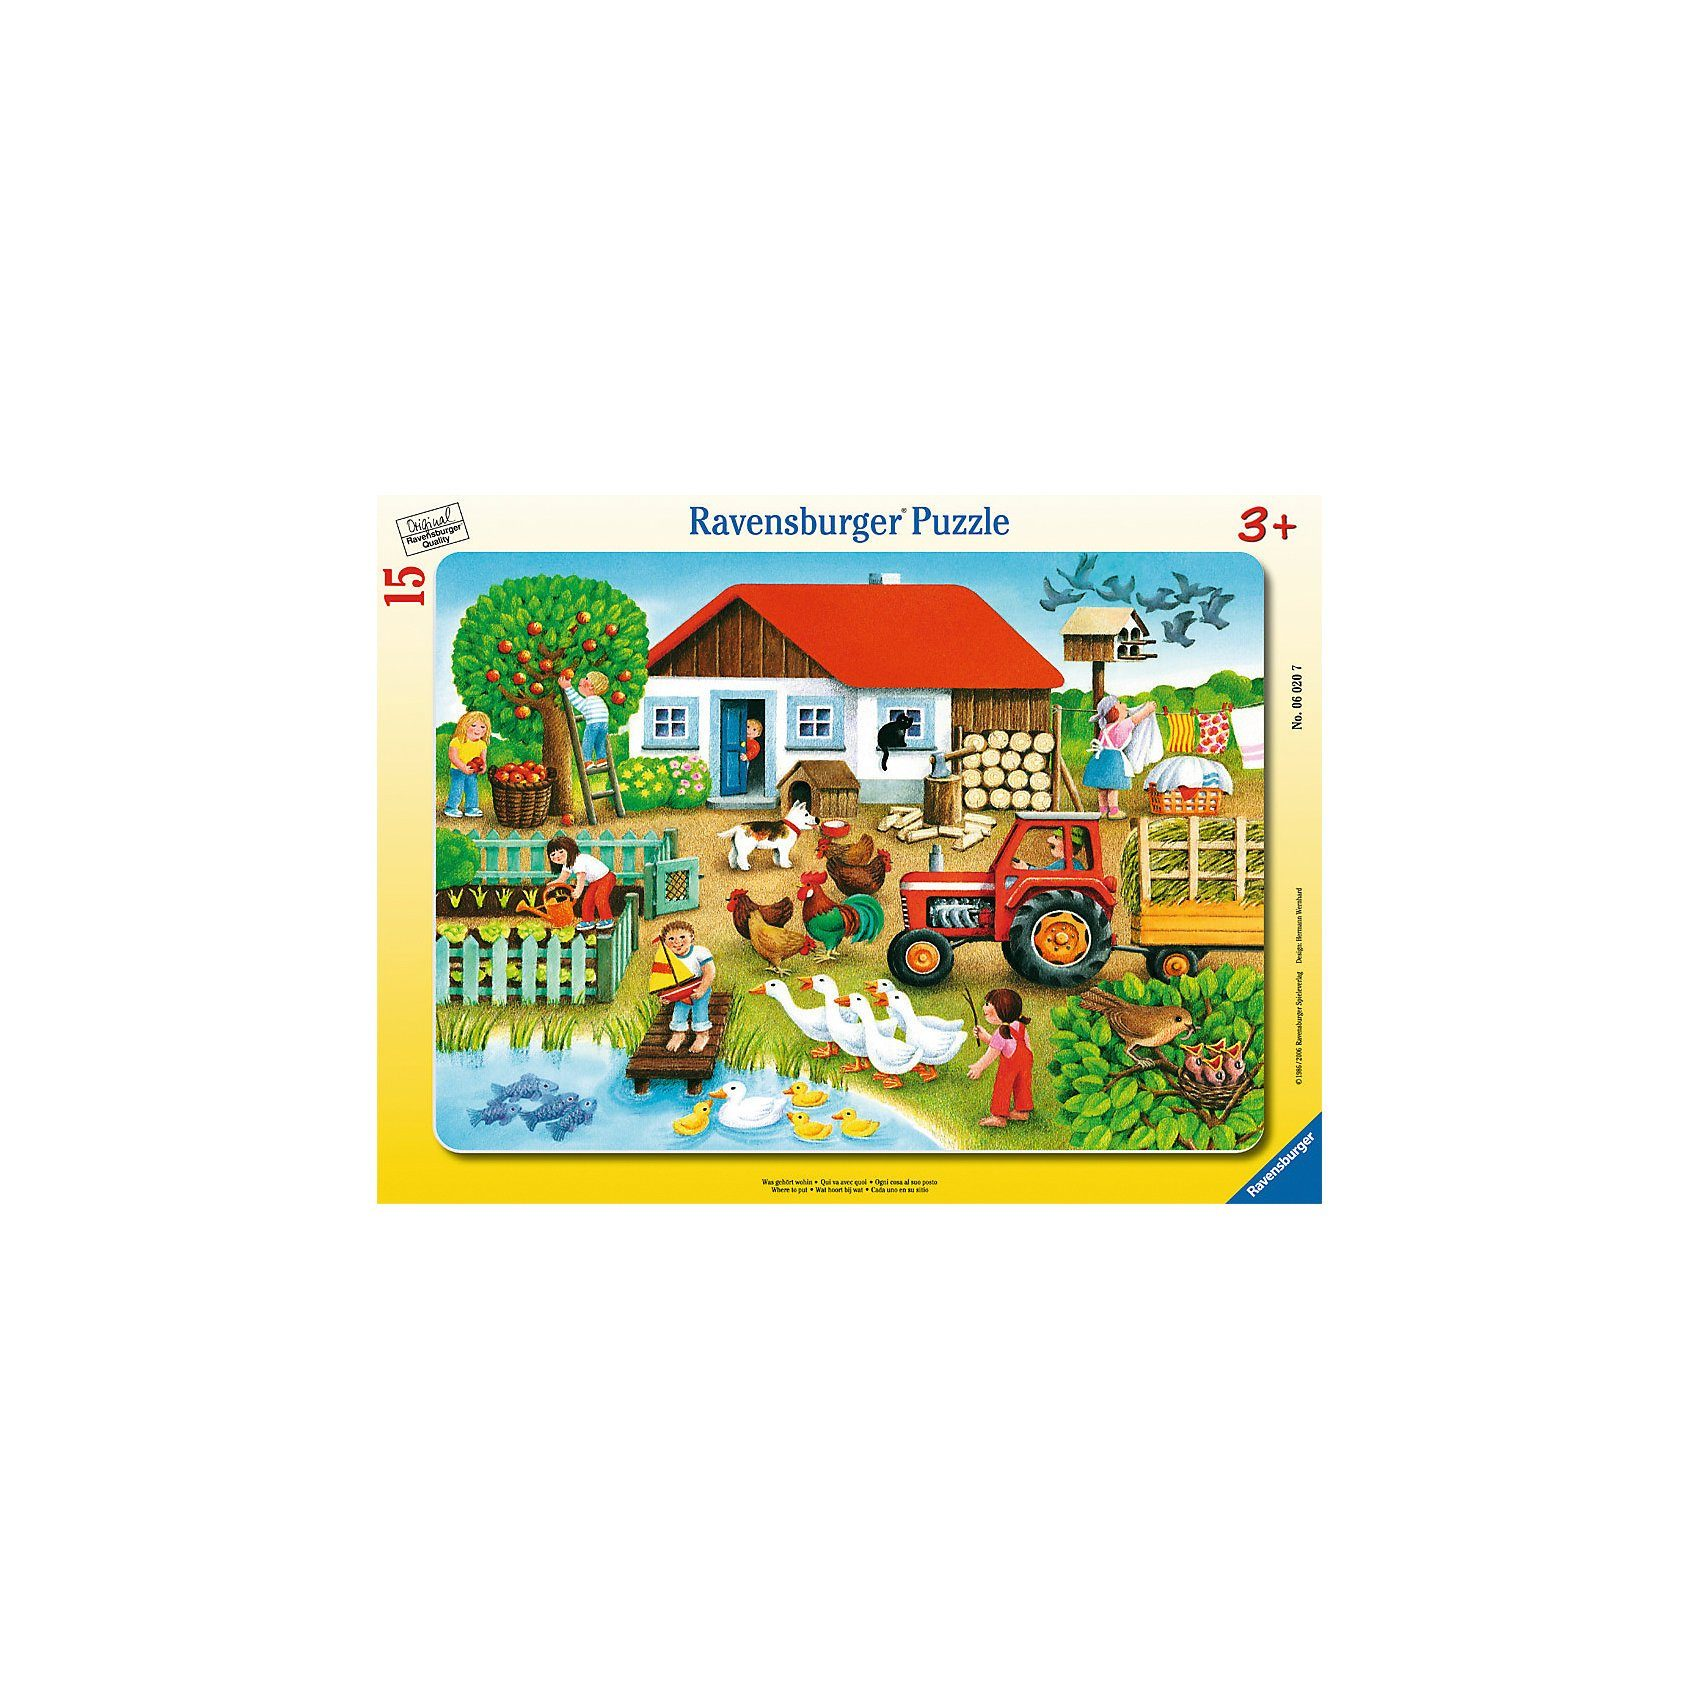 Ravensburger Rahmenpuzzle Was gehört wohin? 15 Teile